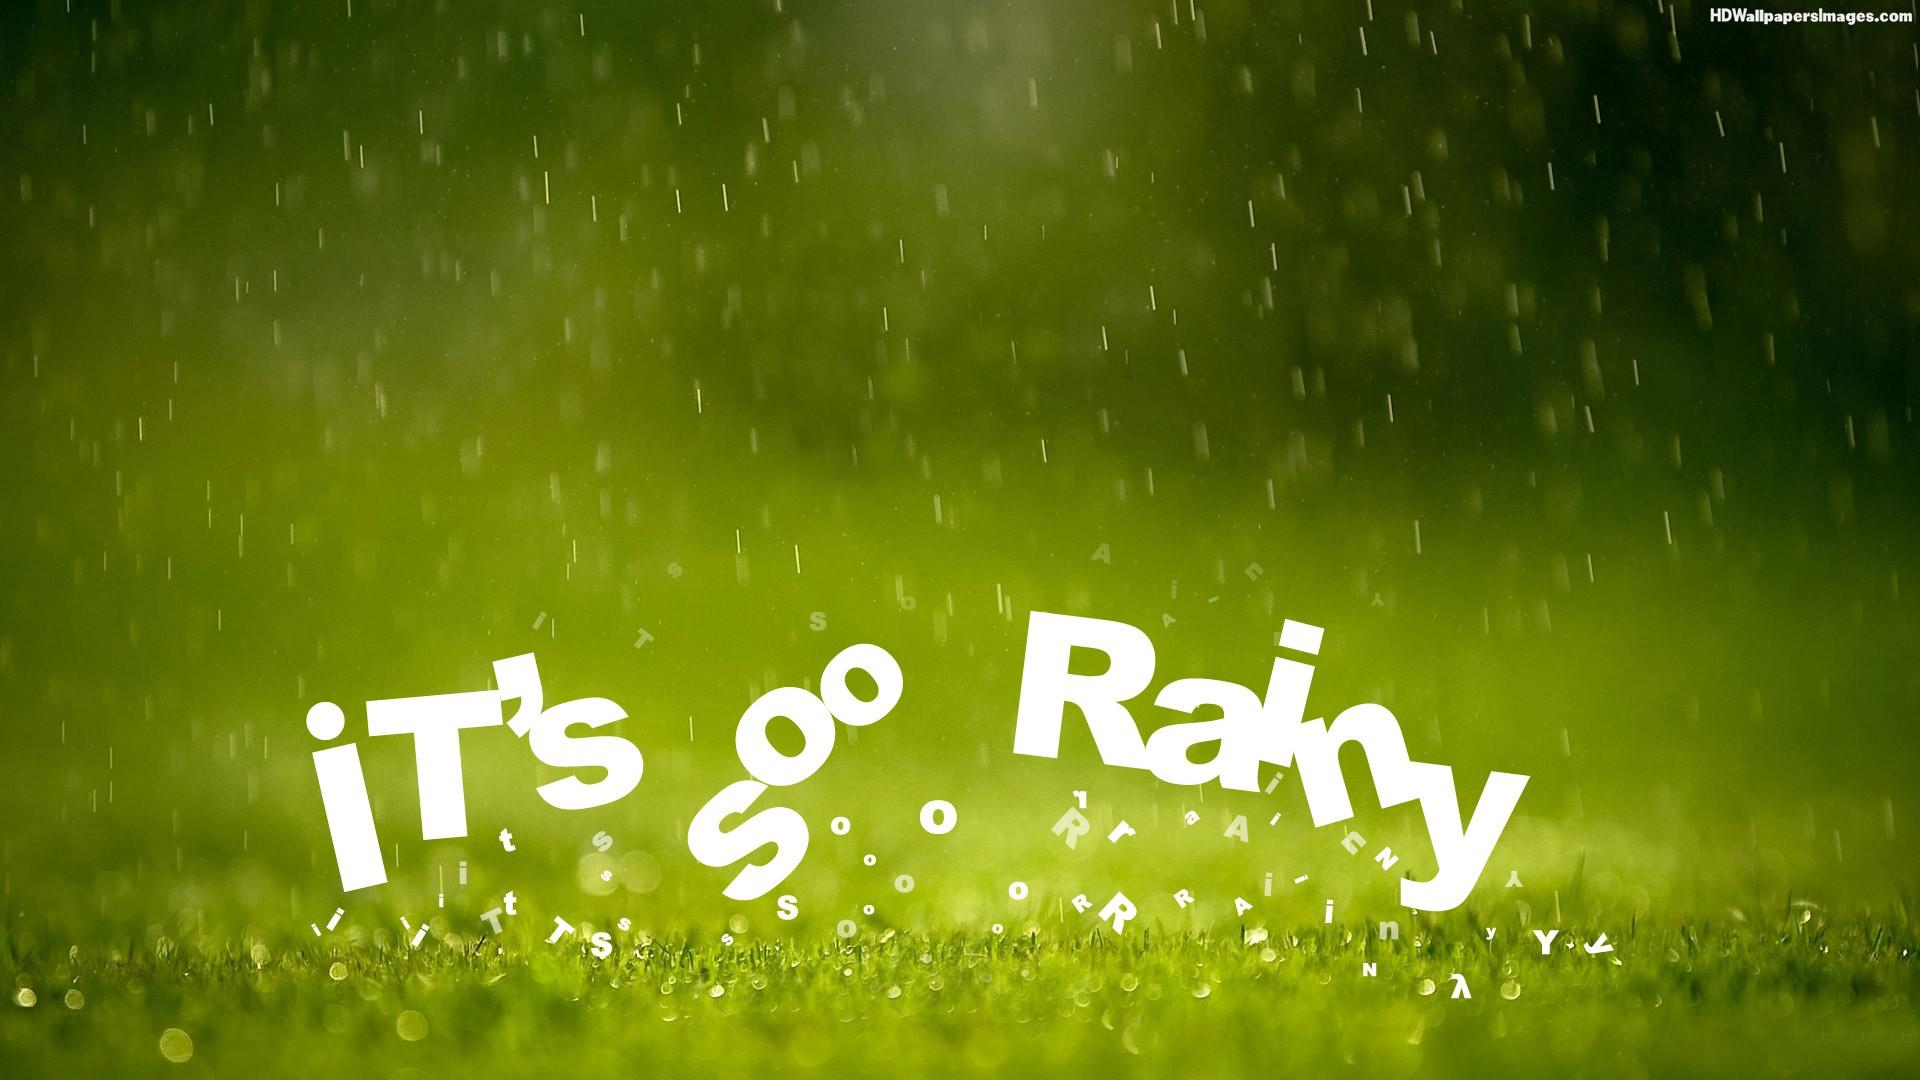 Beautiful Rainy Season Images Hd Wallpaper